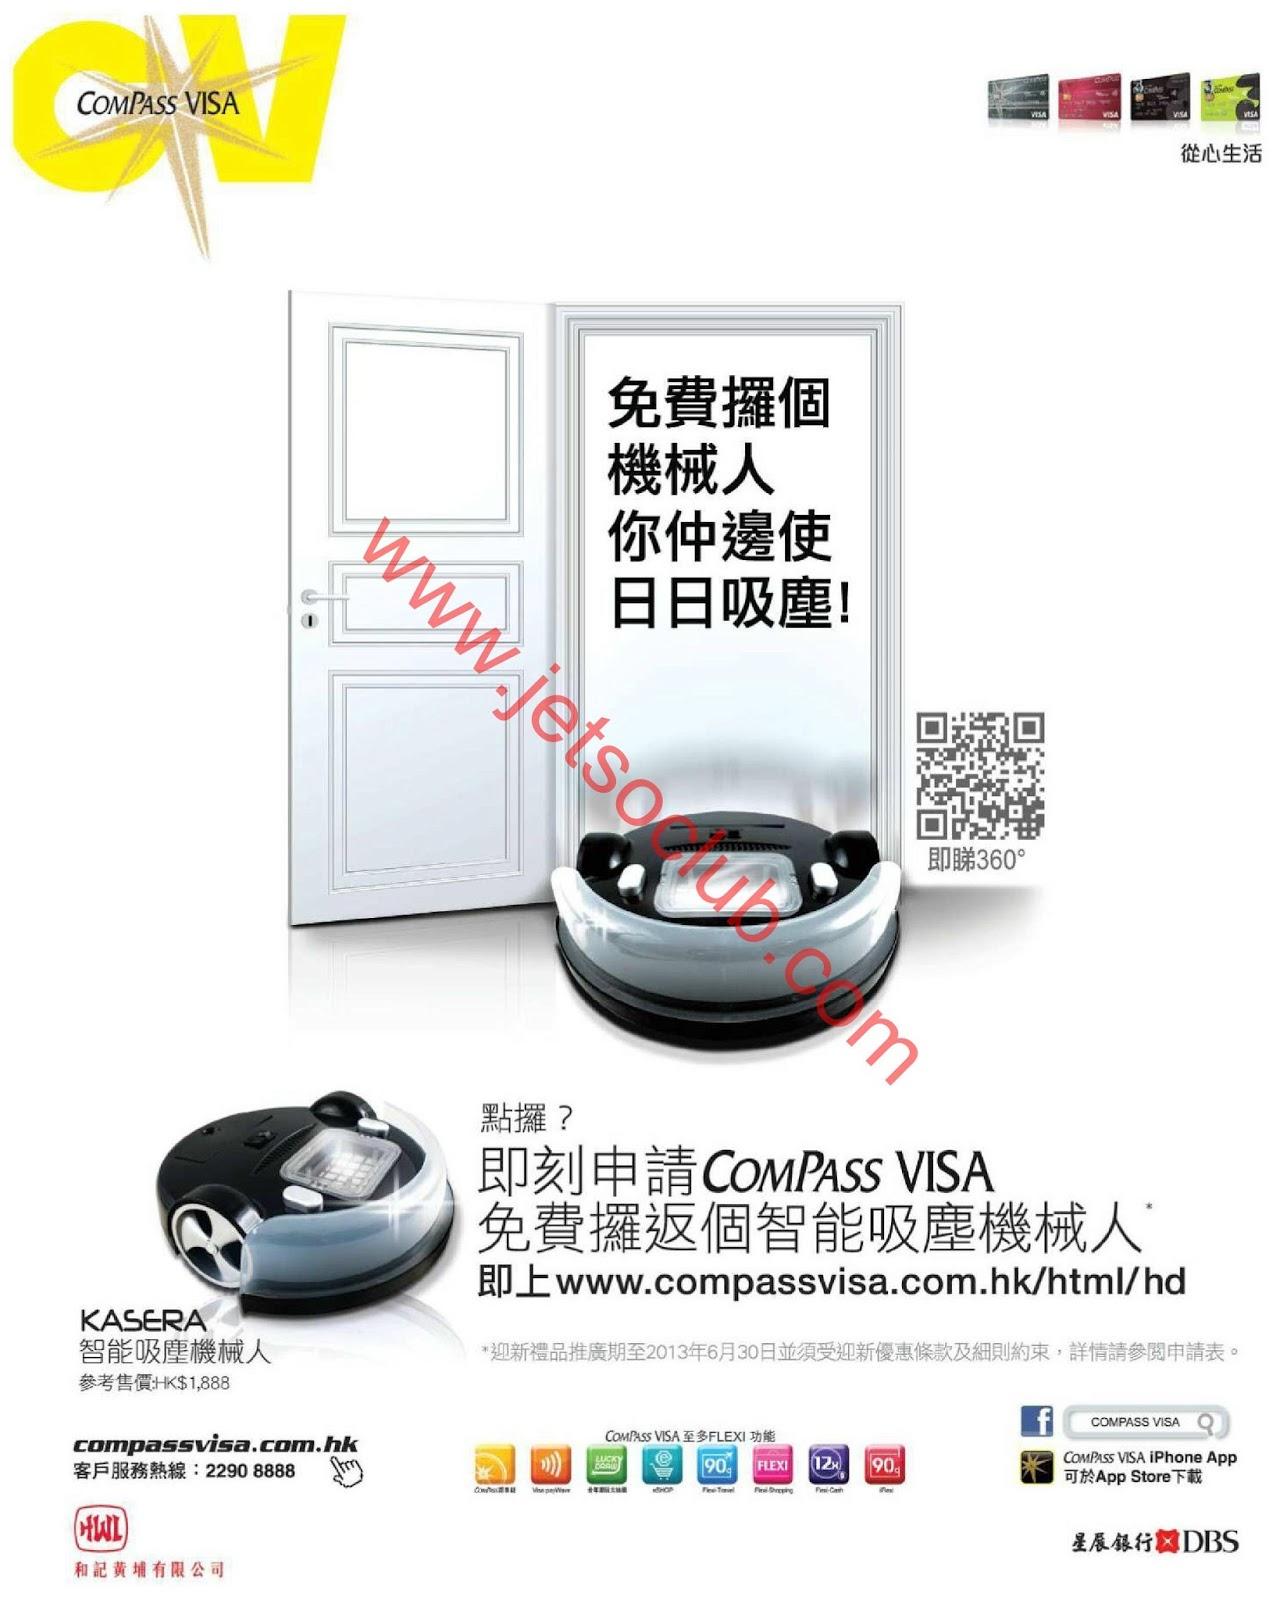 Compass VISA:迎新禮品 - 智能吸塵機械人(至30/6) ( Jetso Club 著數俱樂部 )